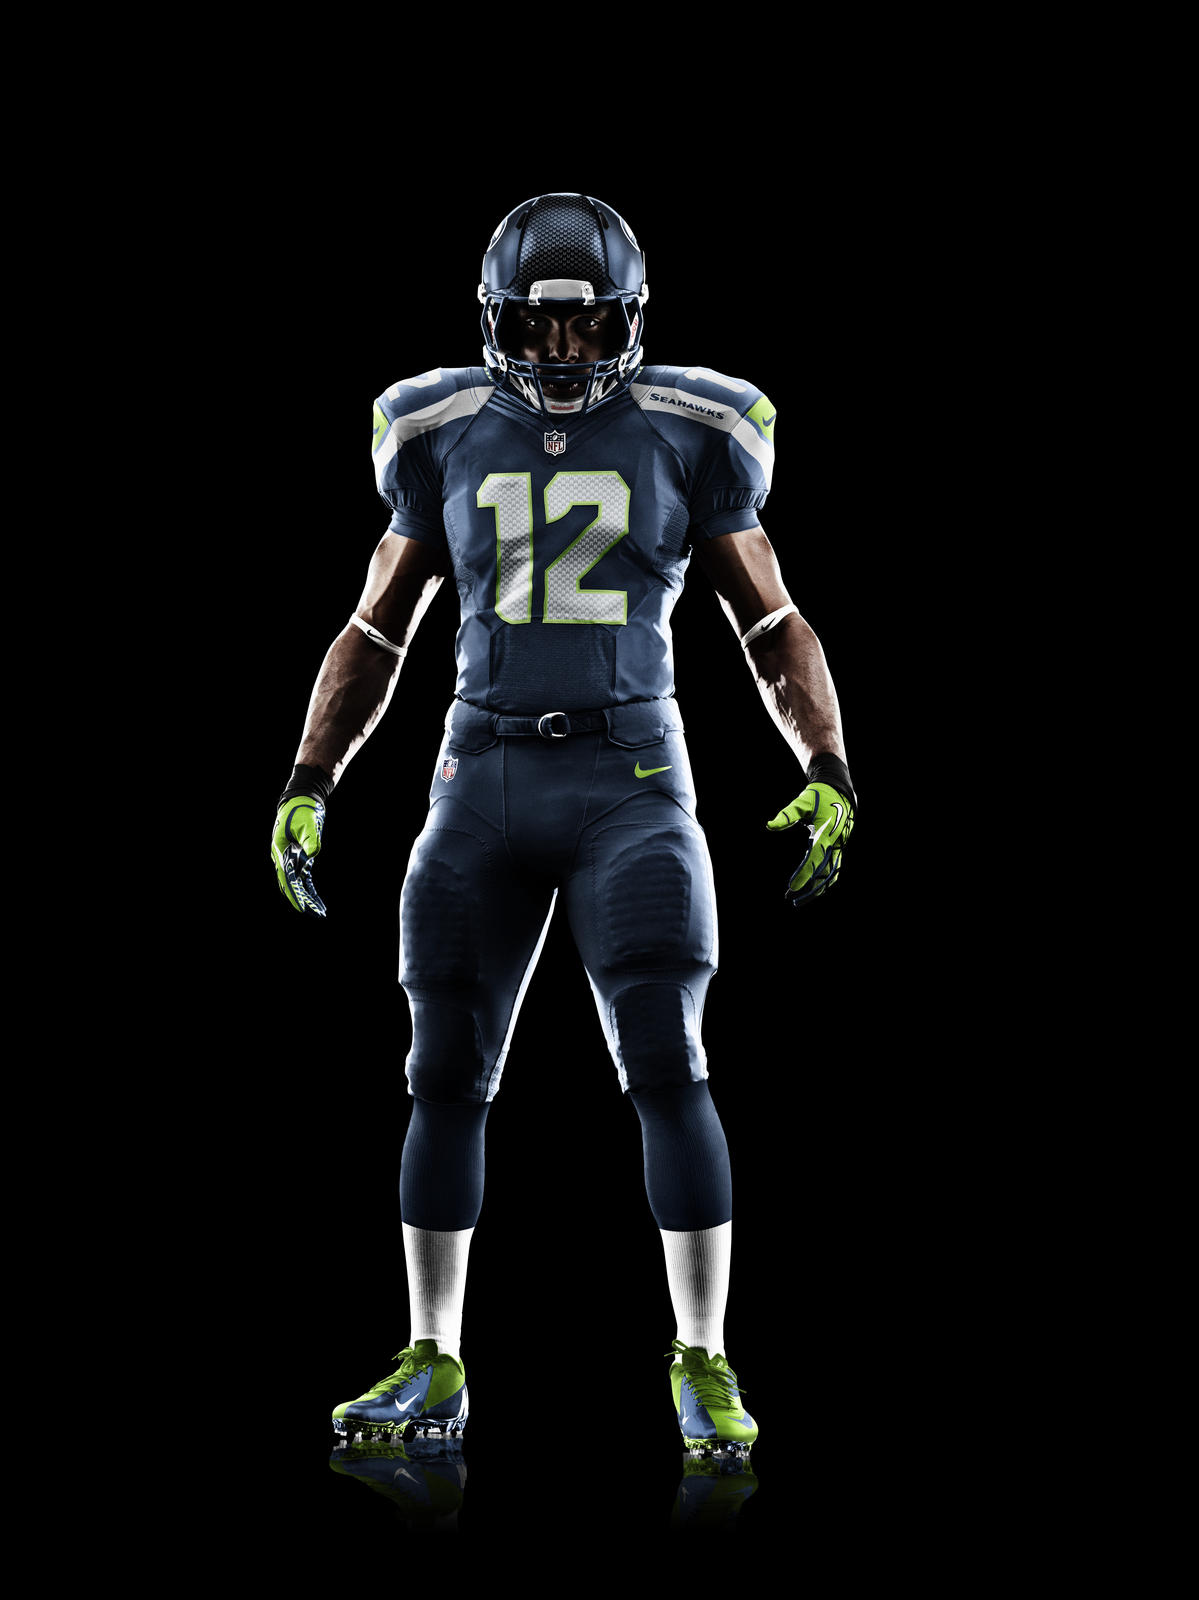 Nfl Football New Uniforms